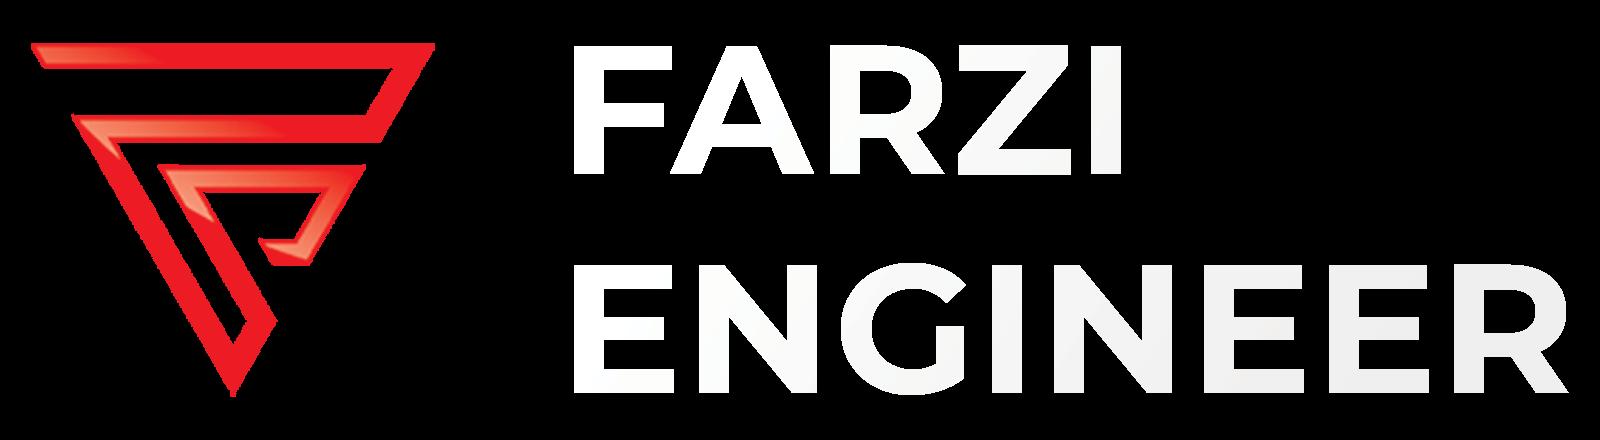 FarziEngineer